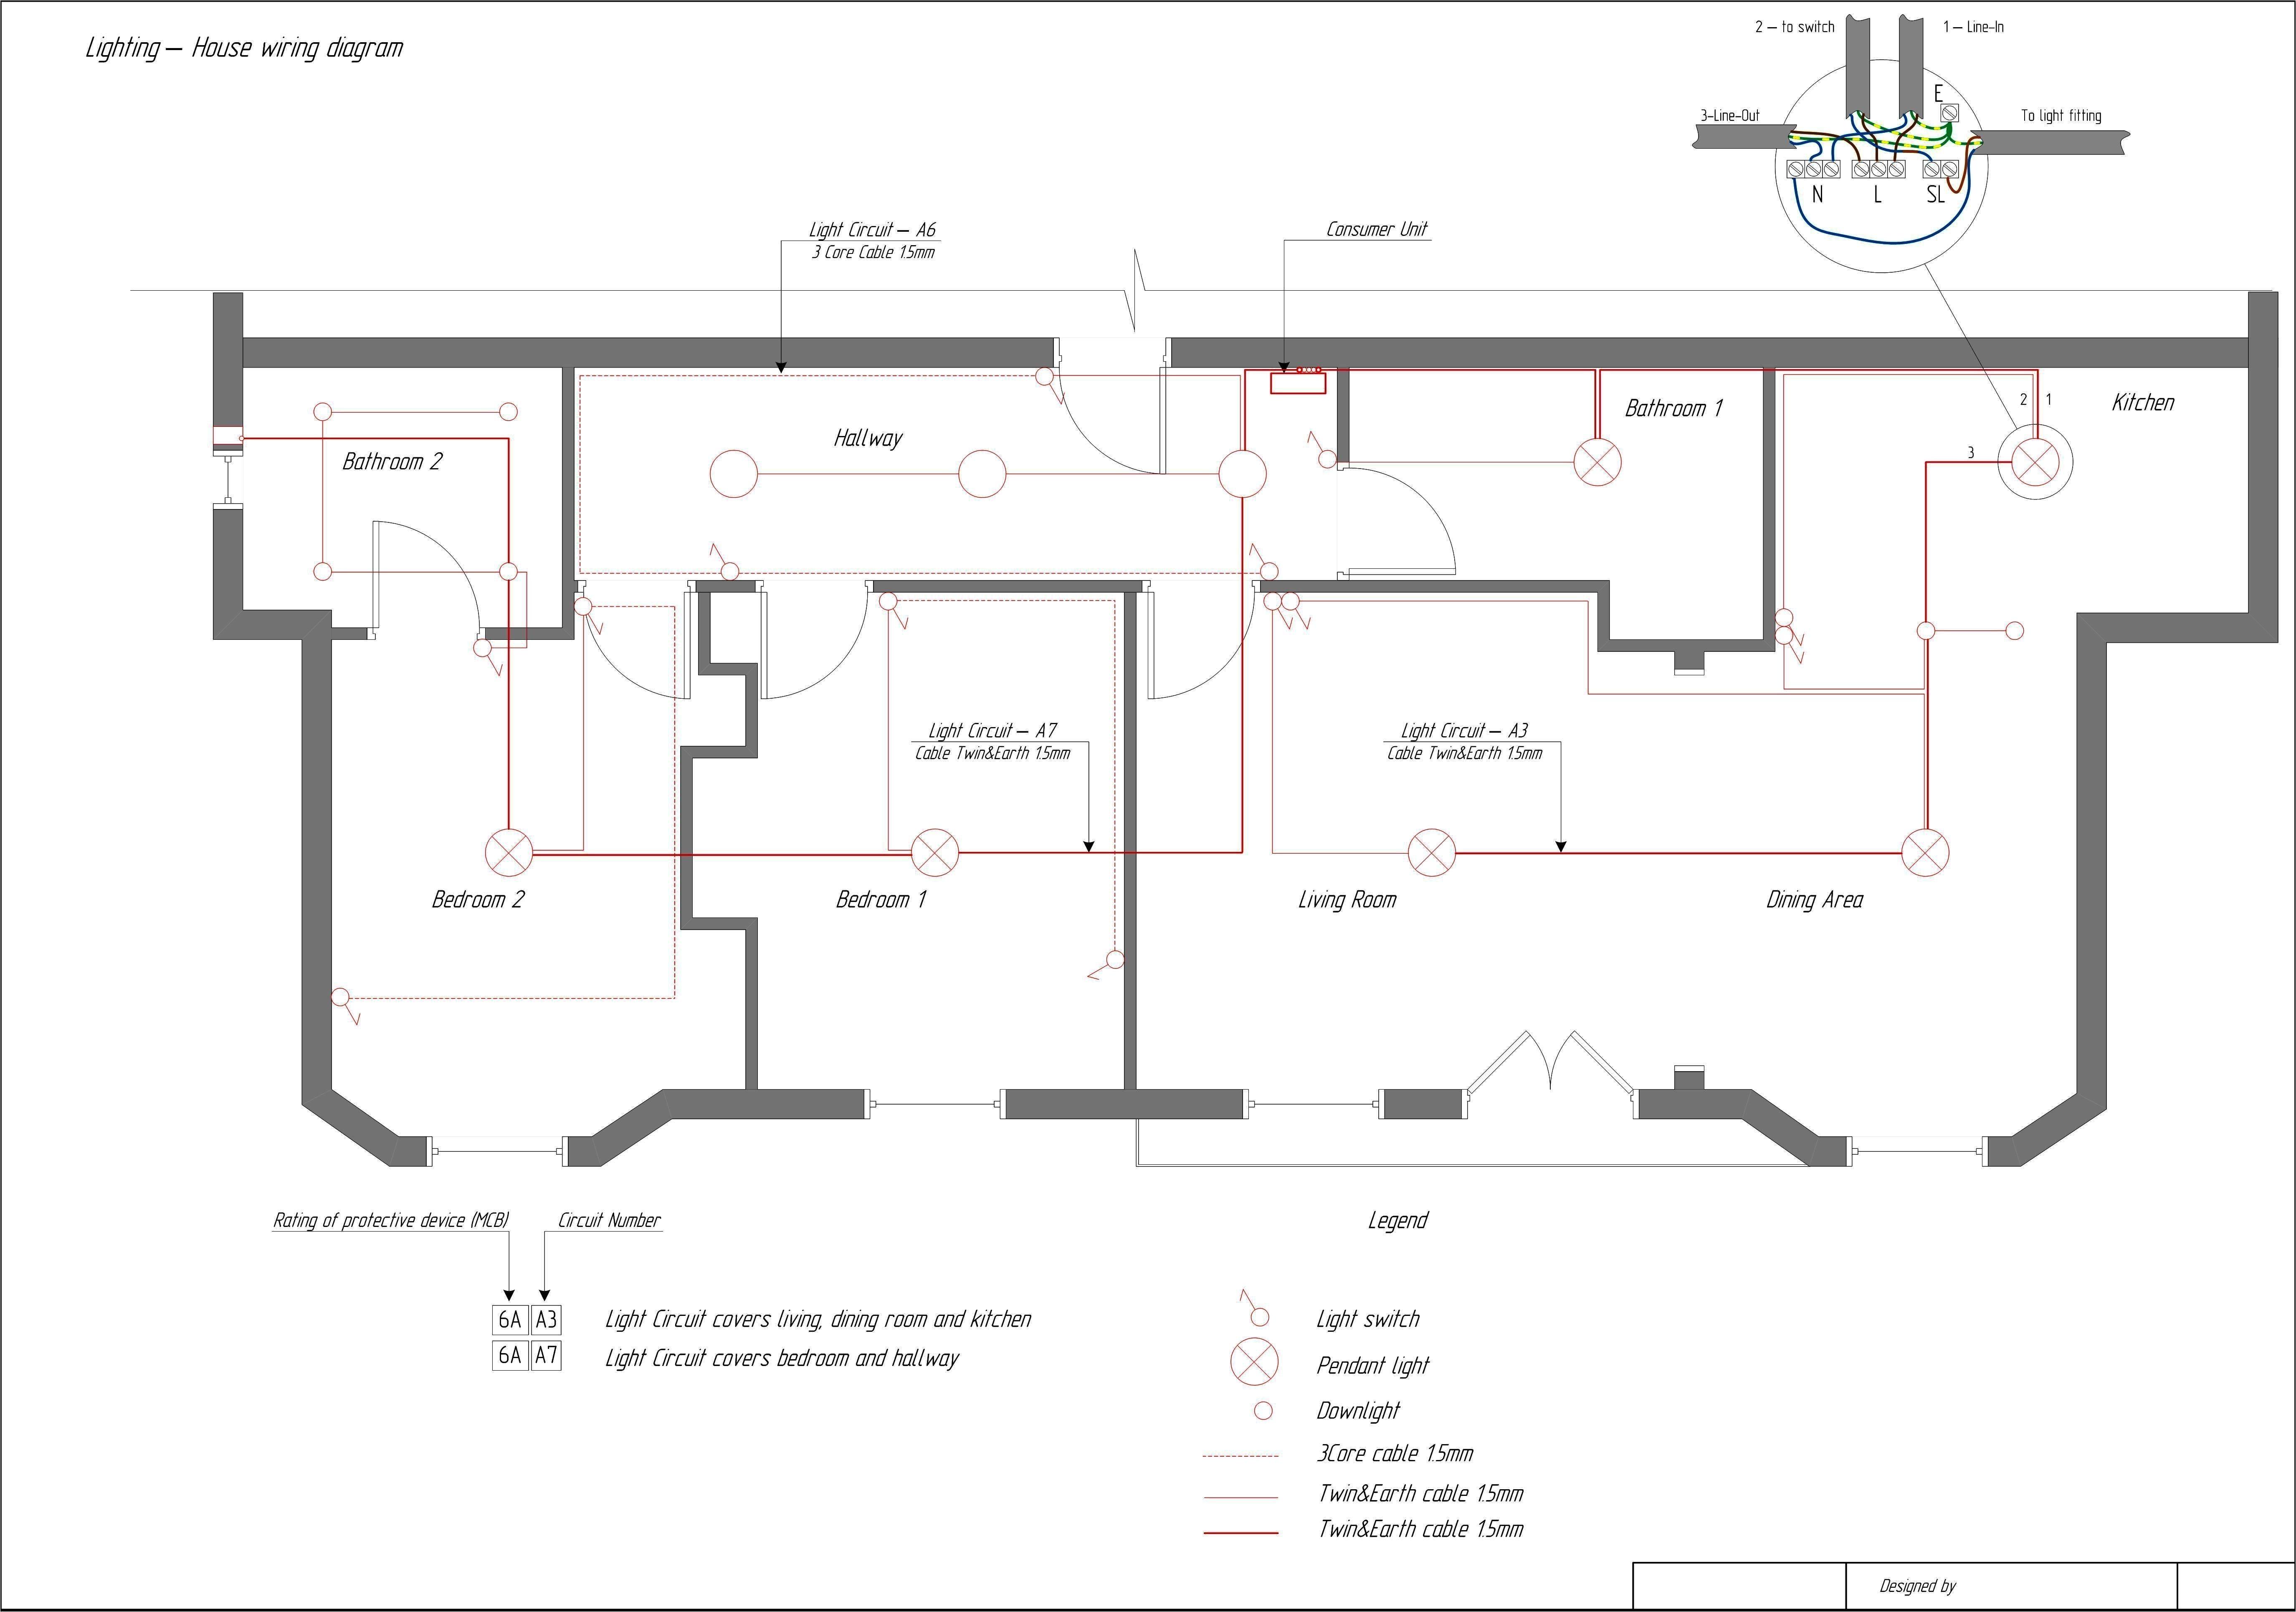 house wiring diagram electrical floor plan 2004 2010 bmw x3 e83 3 0d